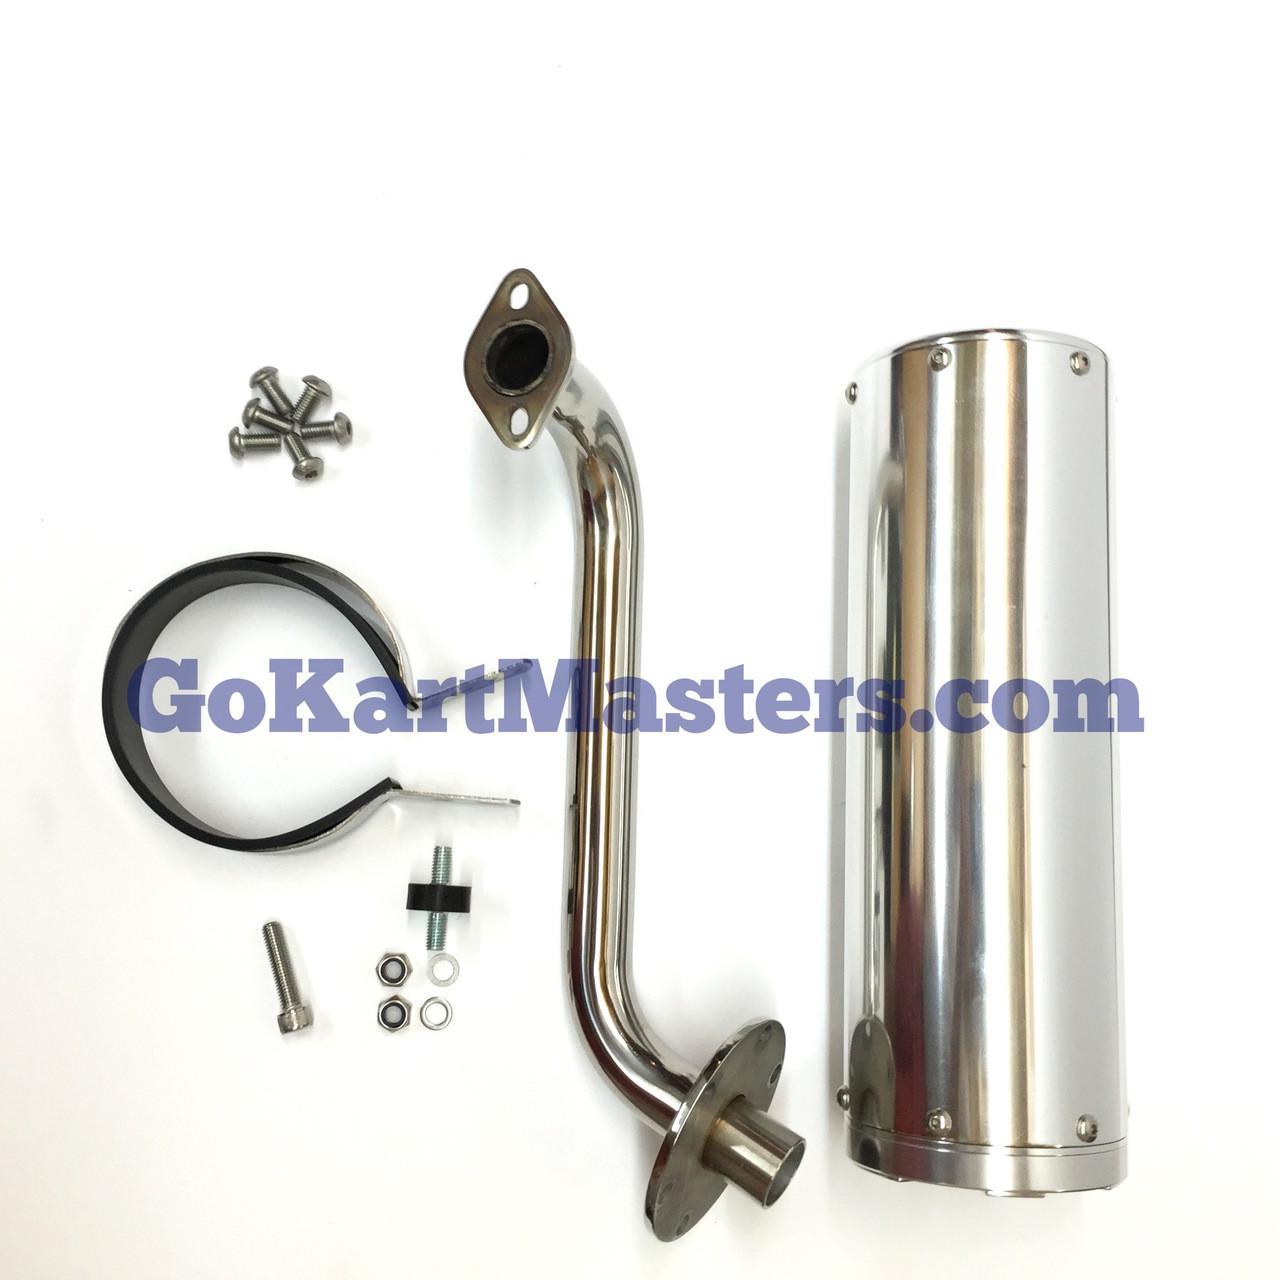 TrailMaster 150 XRS & 150 XRX Performance Exhaust System